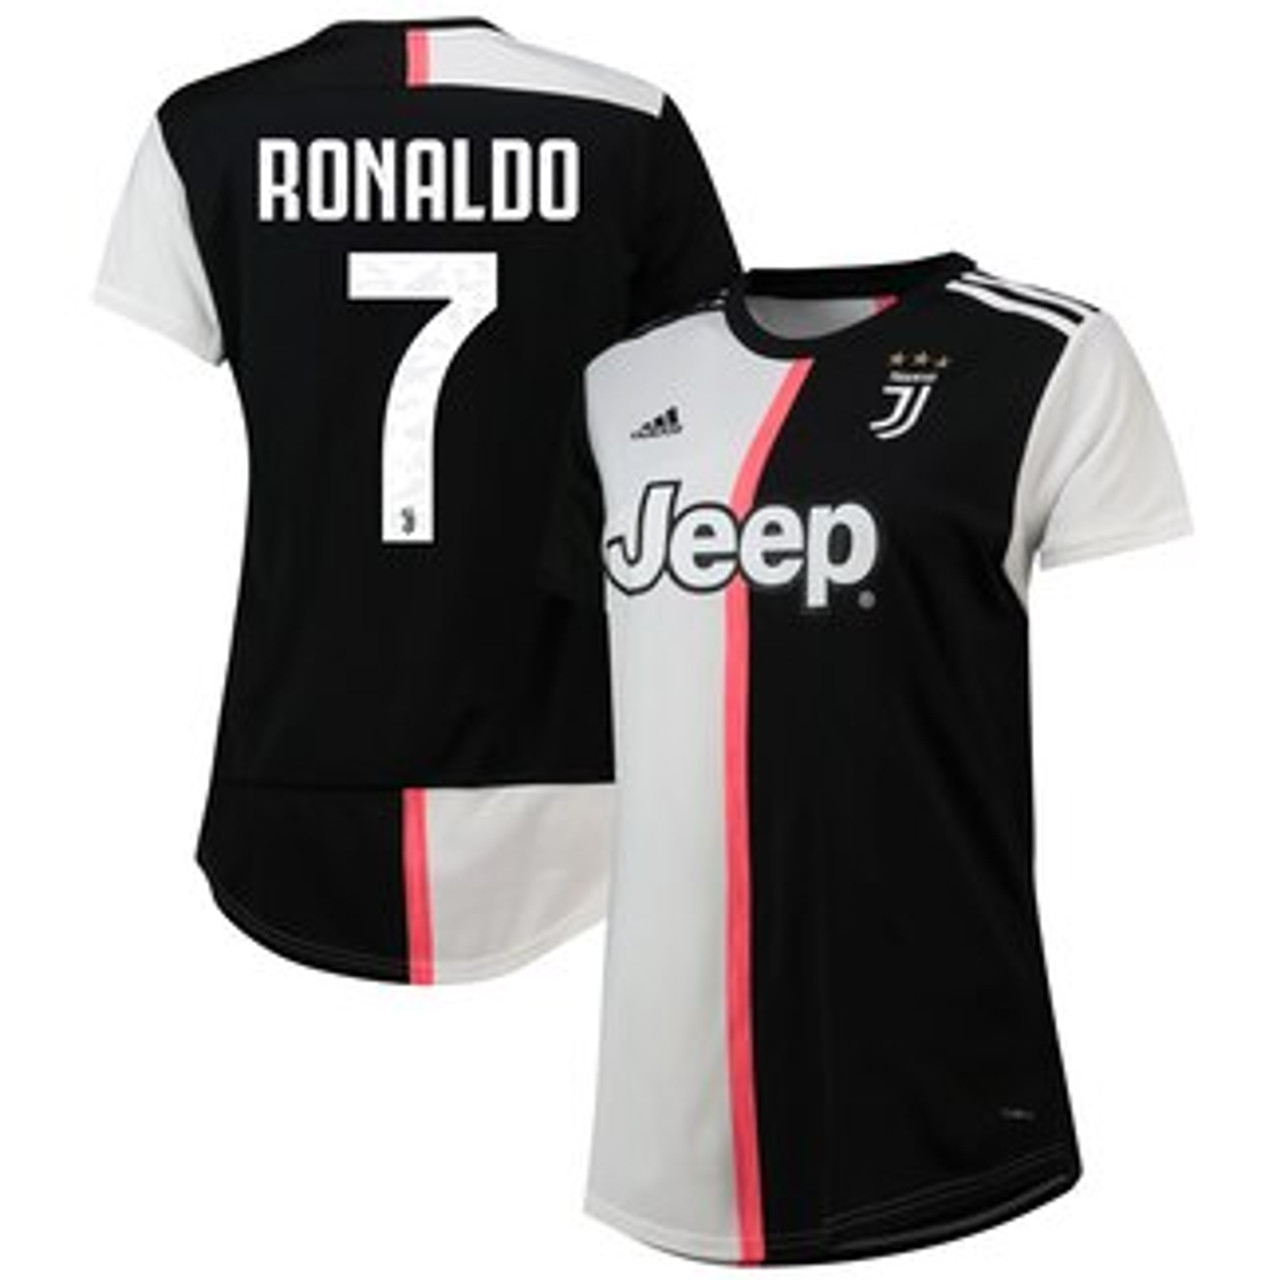 Adidas Juventus 2020 Home Ronaldo Jersey Soccer Plus